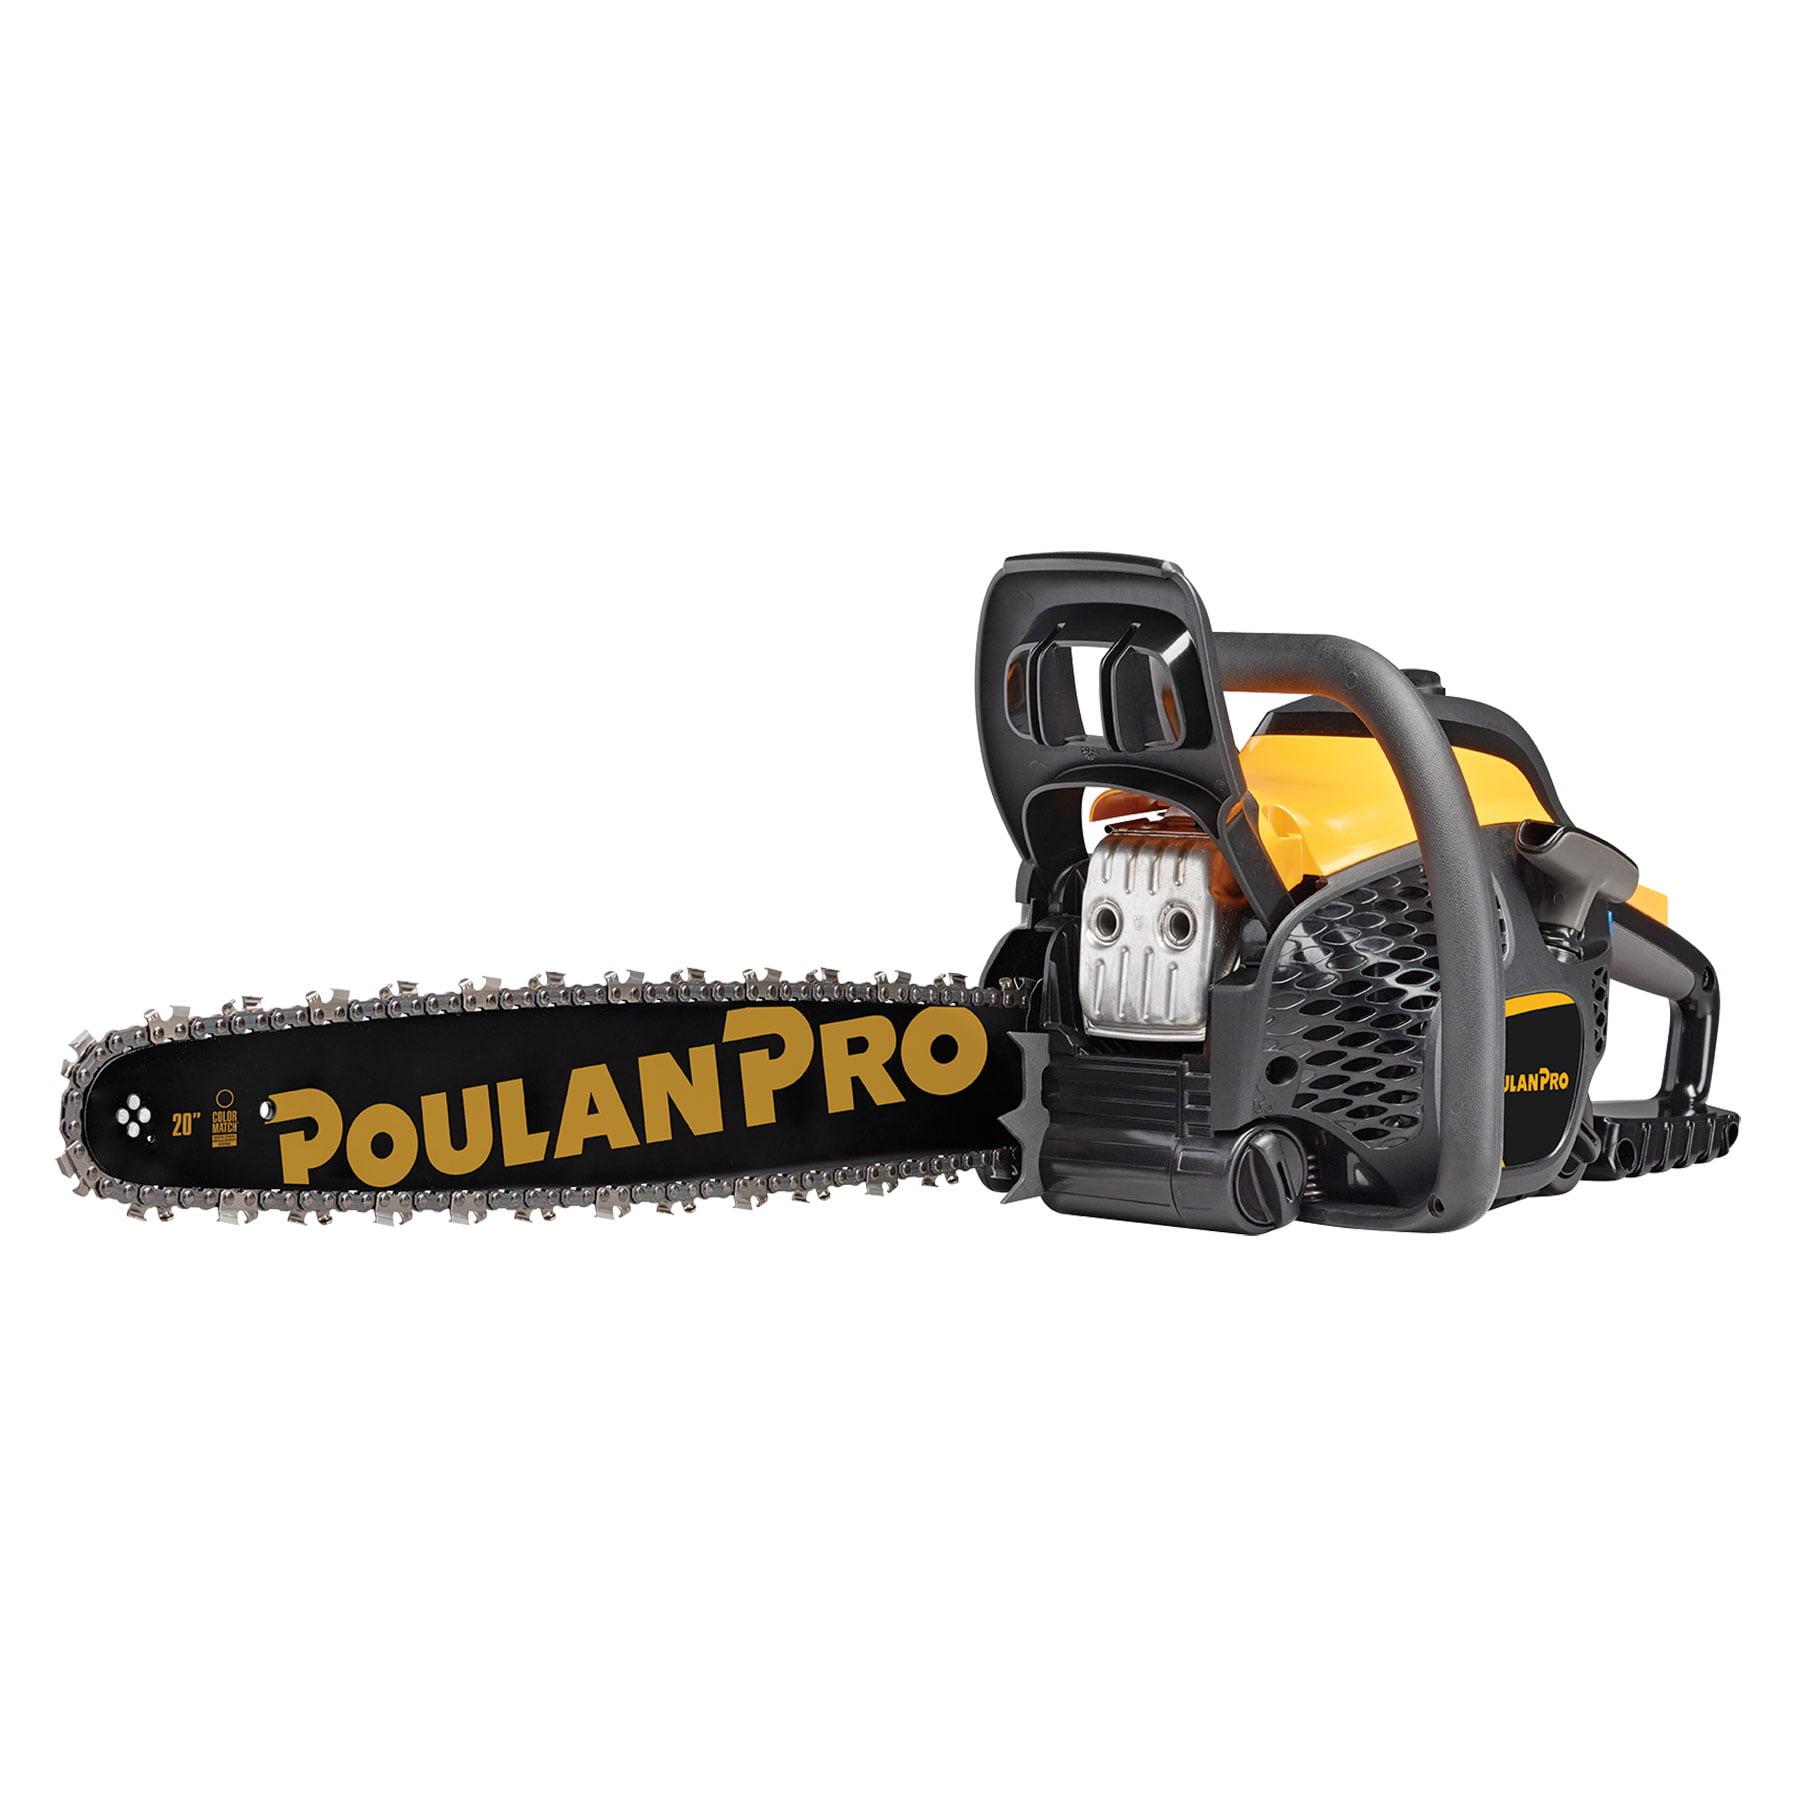 "Poulan Pro PPR5020-BRC 20"" Bar 50cc 2 Cycle Gas Chainsaw (Certified Refurbished) by Poulan Pro"